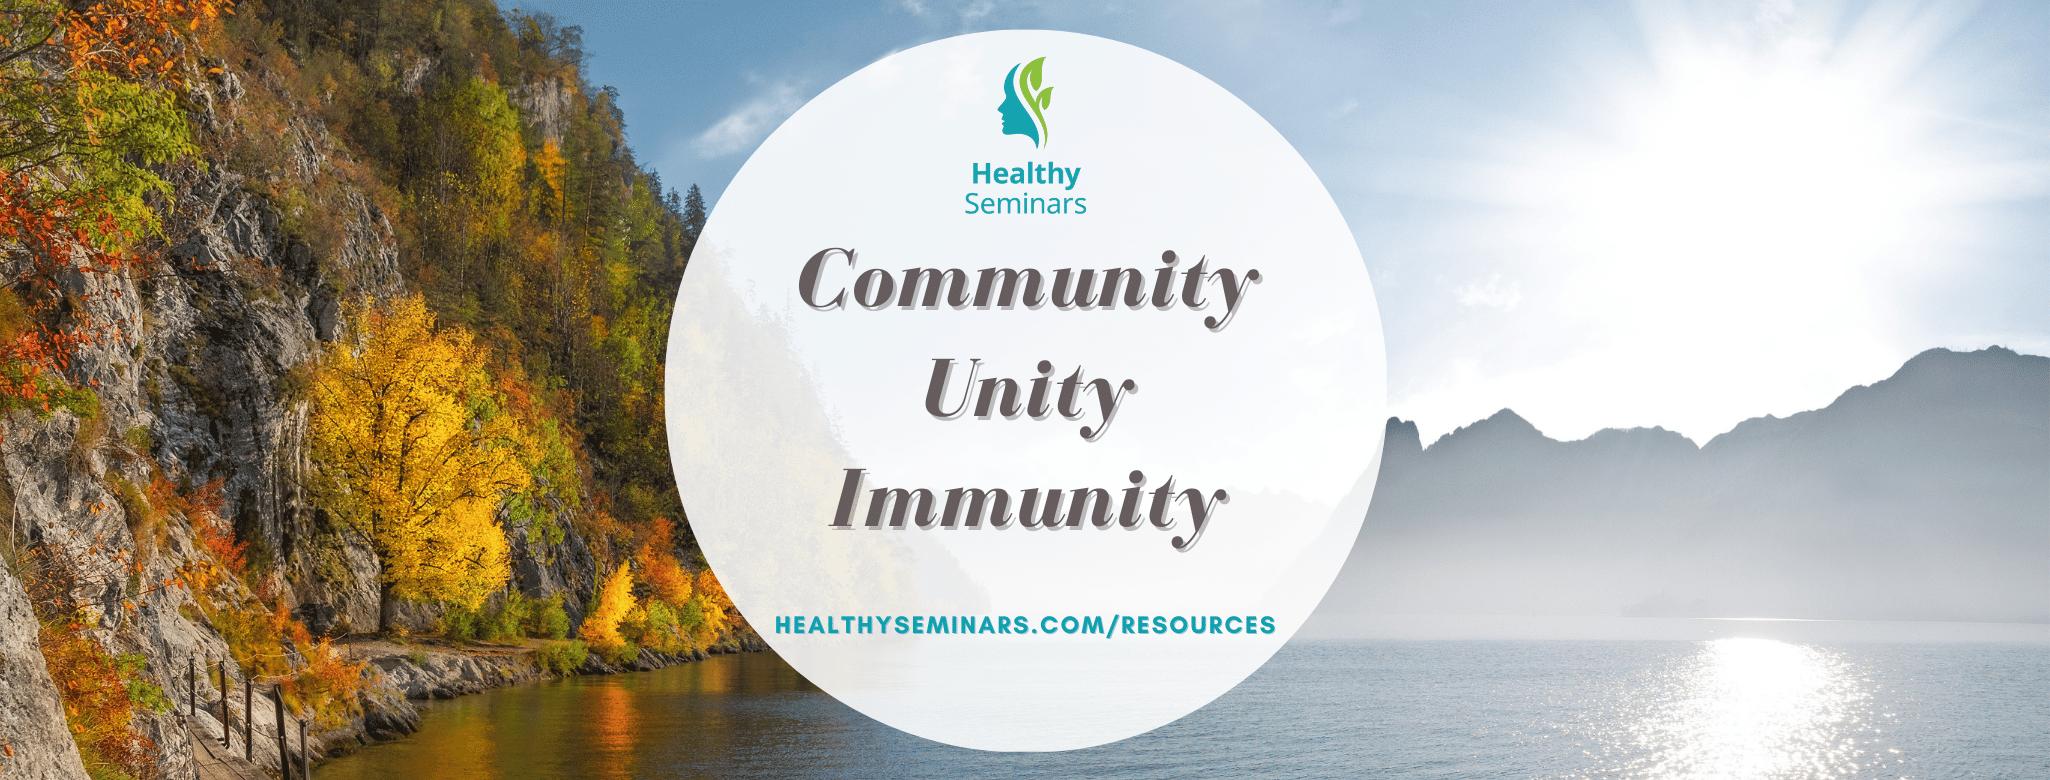 Community Unity Immunity